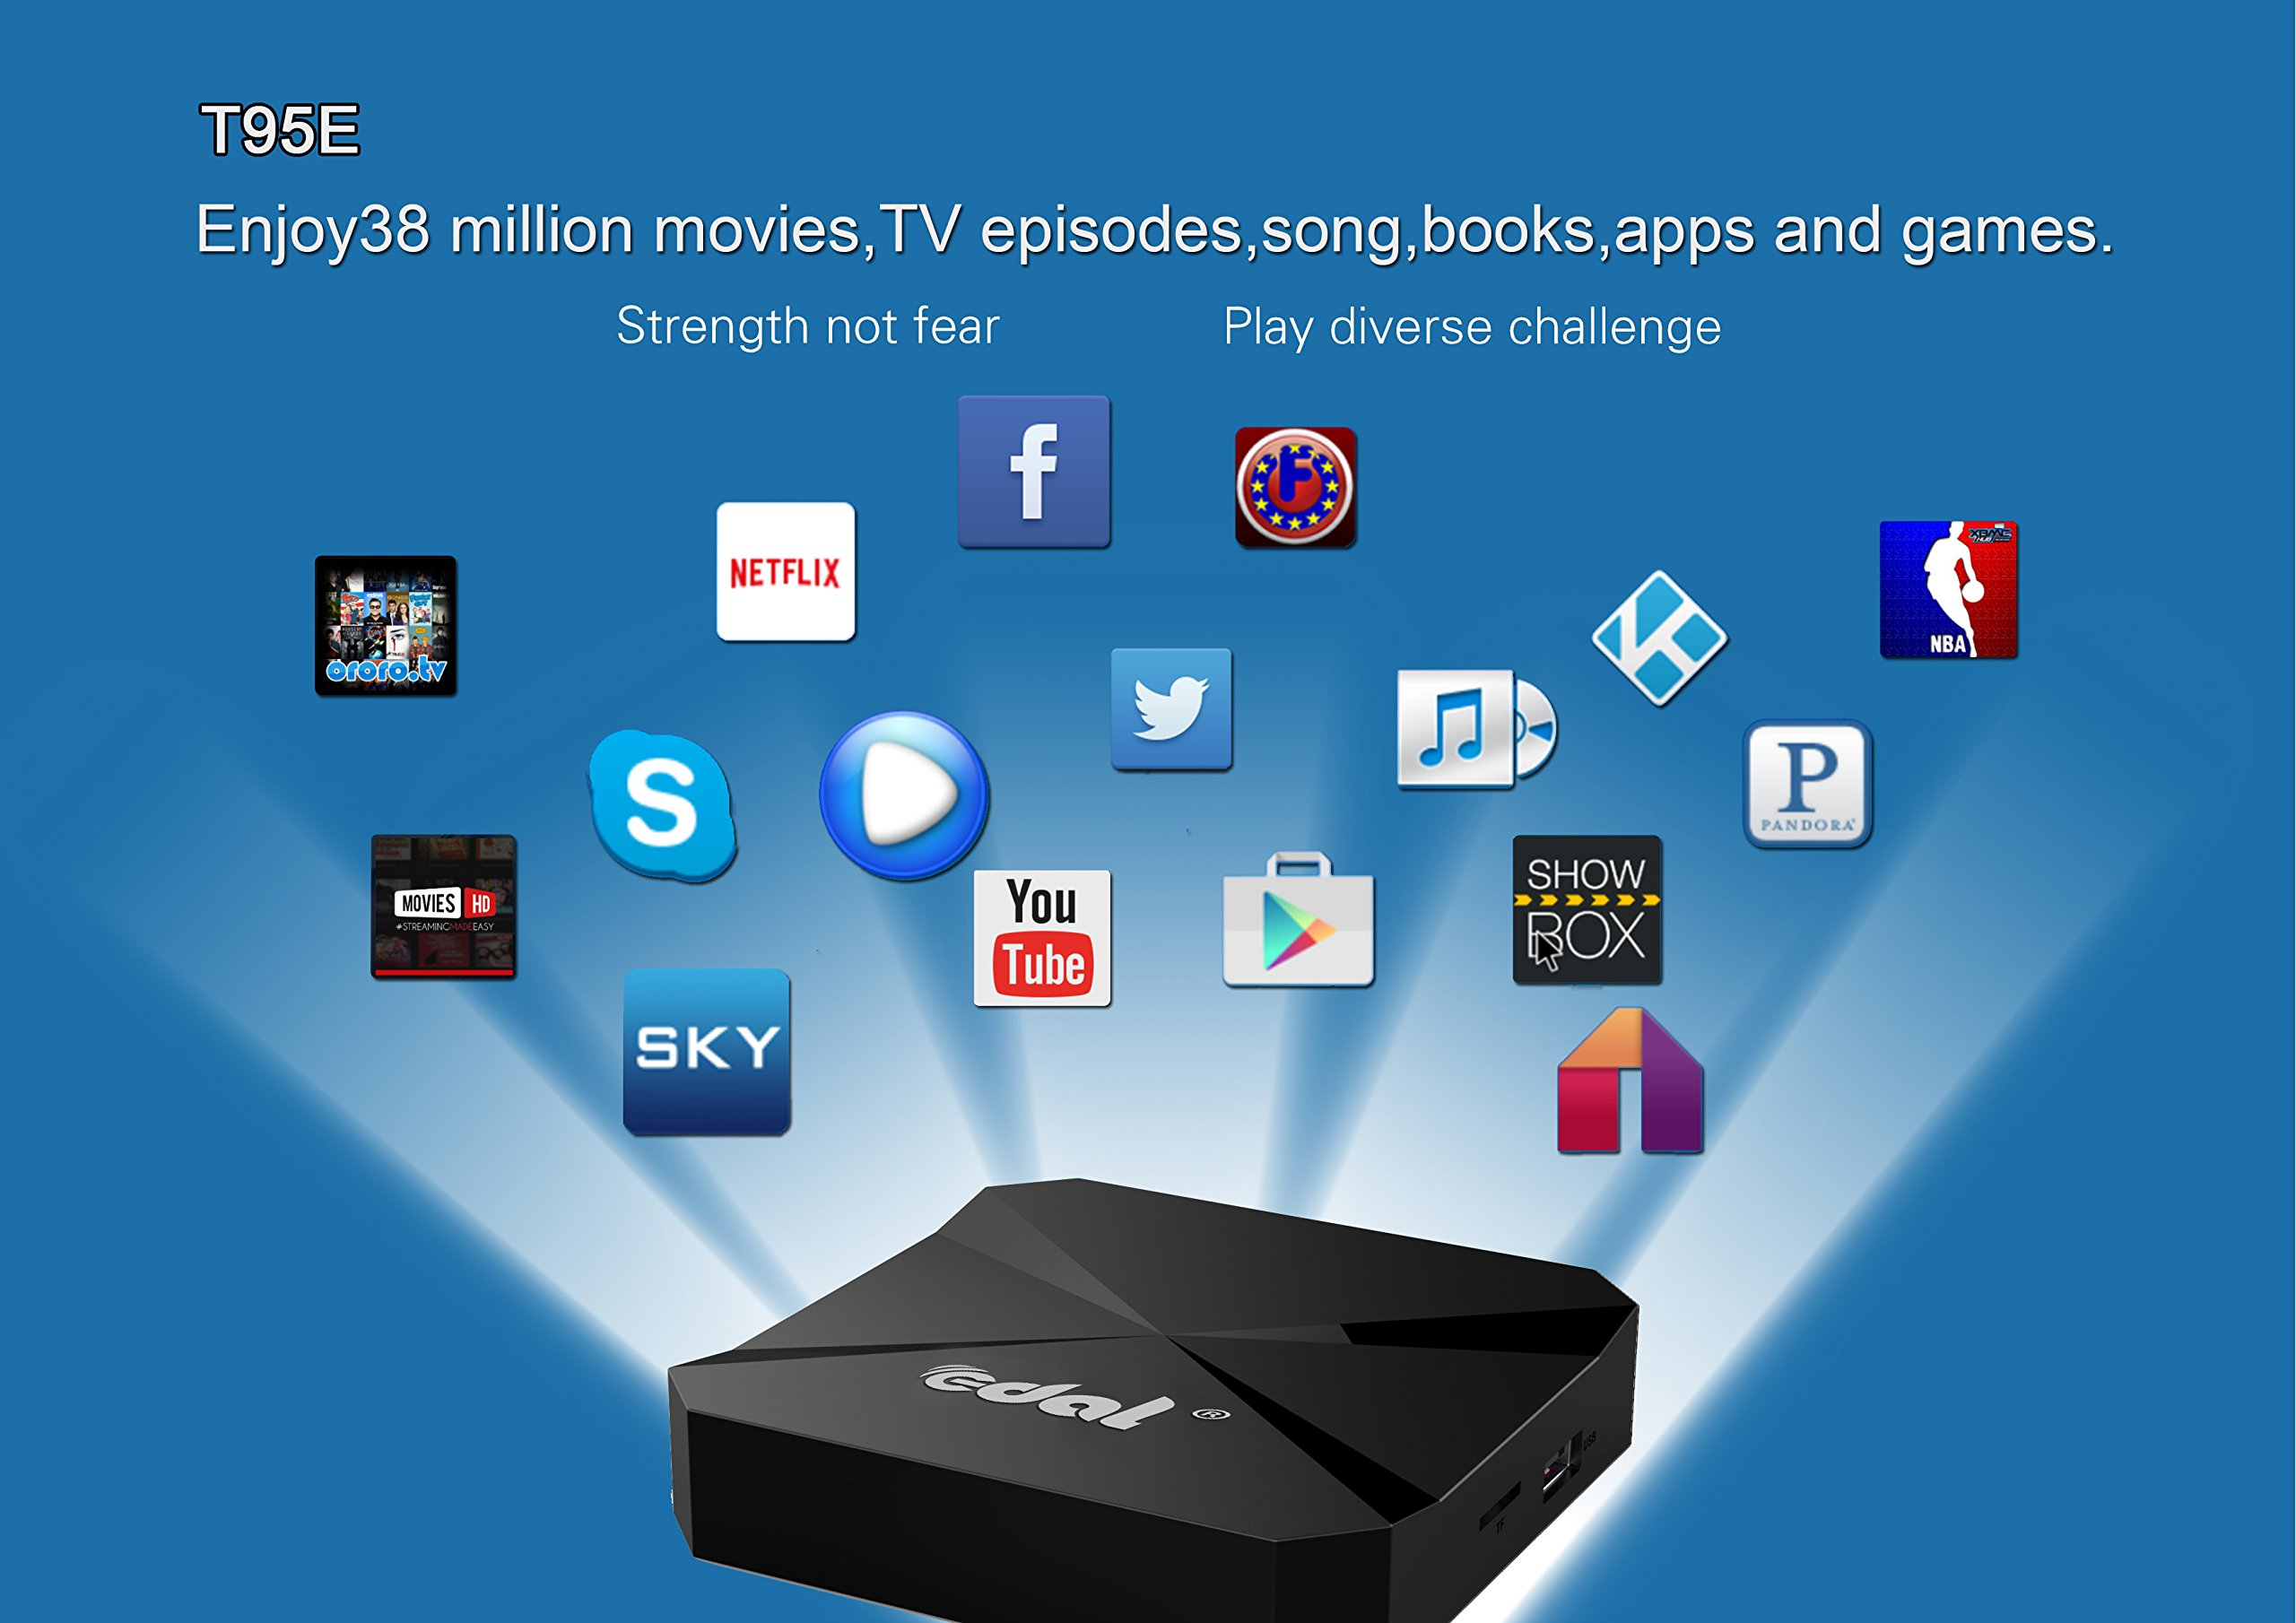 Edal T95E Android TV BOX RK3229 Quad Core 32bit TV Box 1GB/8GB wifi 2 4GHz  support 4K HD Video HDMI TV Box